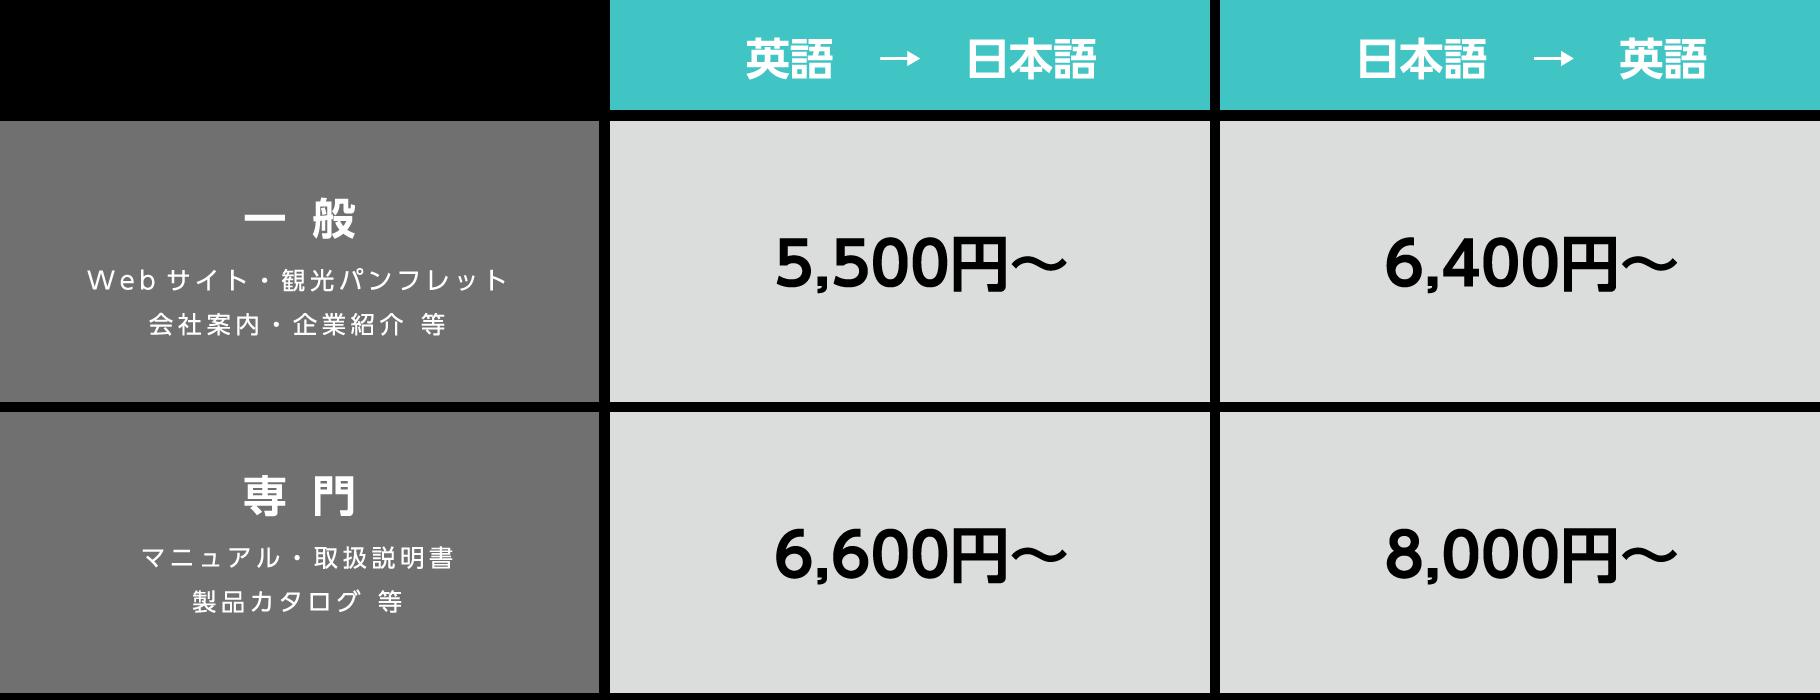 一般 英語→日本語 5,500円〜 日本語→英語 6,400円〜 専門 英語→日本語 6,600円〜 日本語→英語 8,000円〜